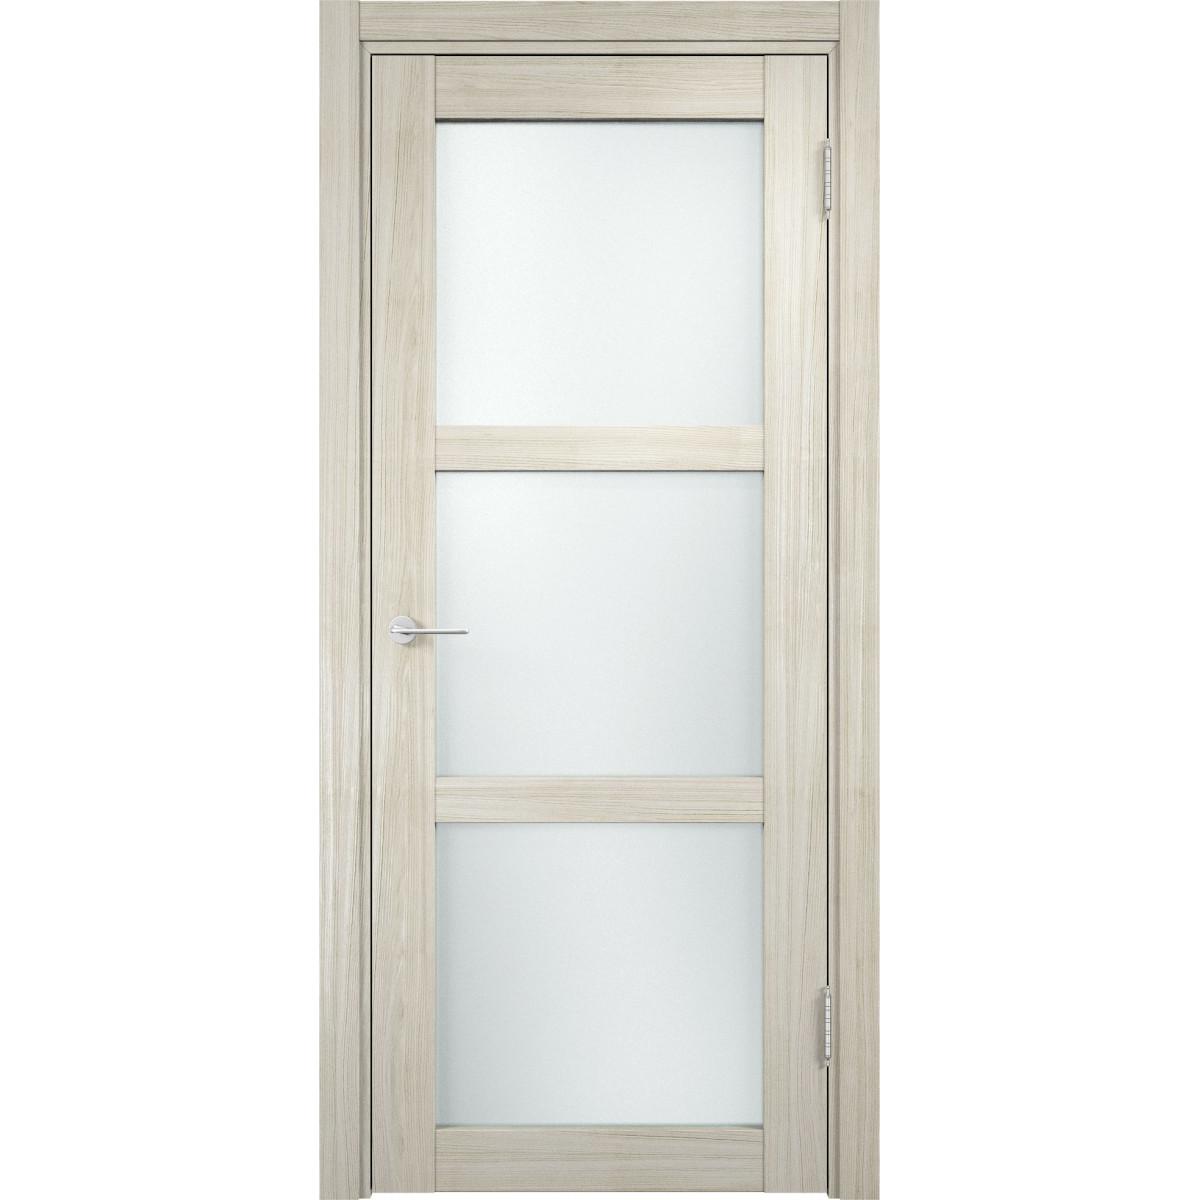 Дверное полотно Casaporte Рома МП_0097 2000х800х44 мм МДФ